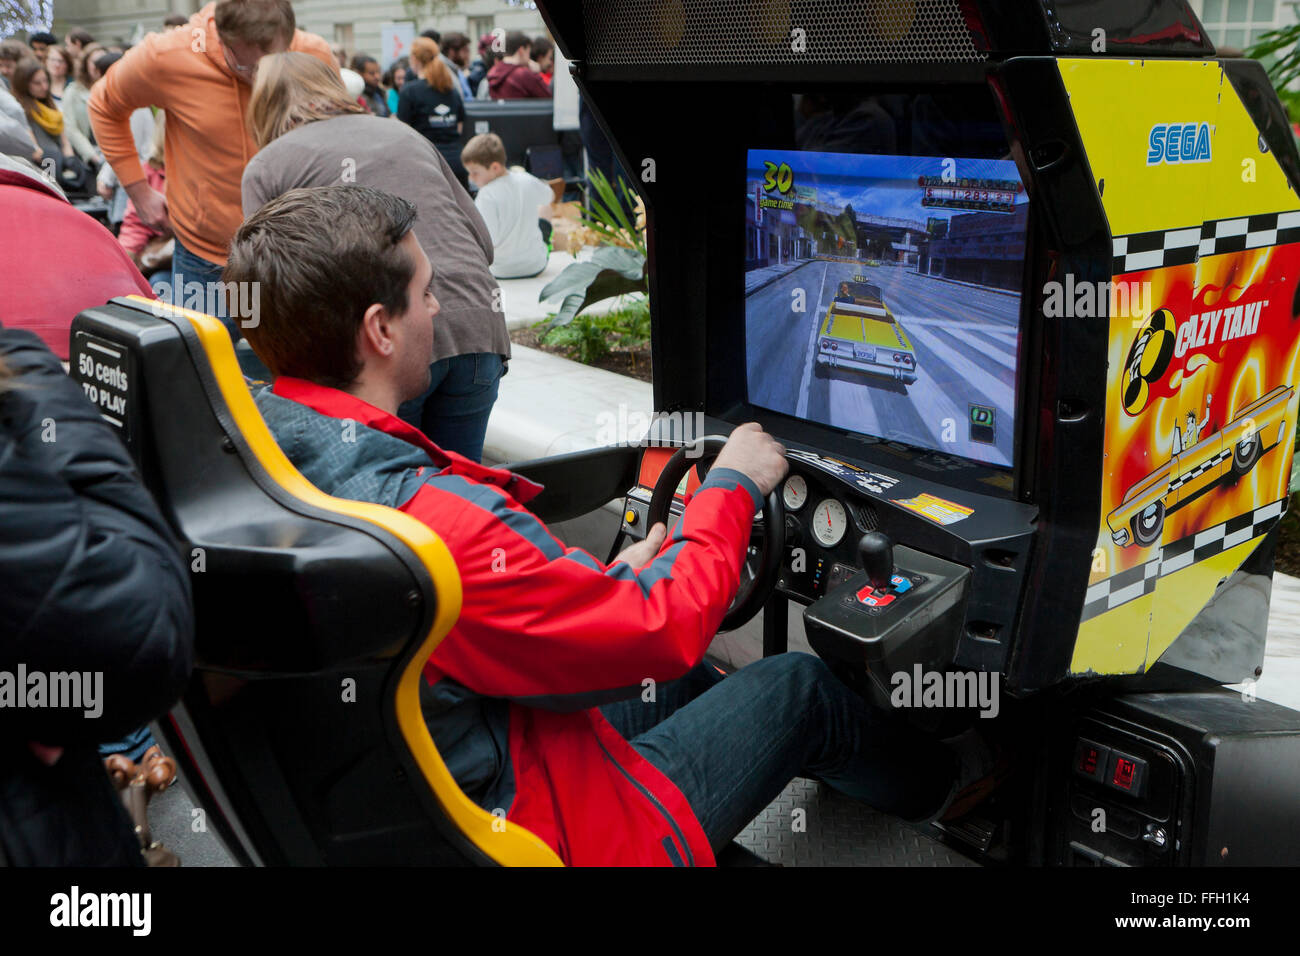 Man Crazy Taxi de Sega jeu d'arcade - USA Photo Stock